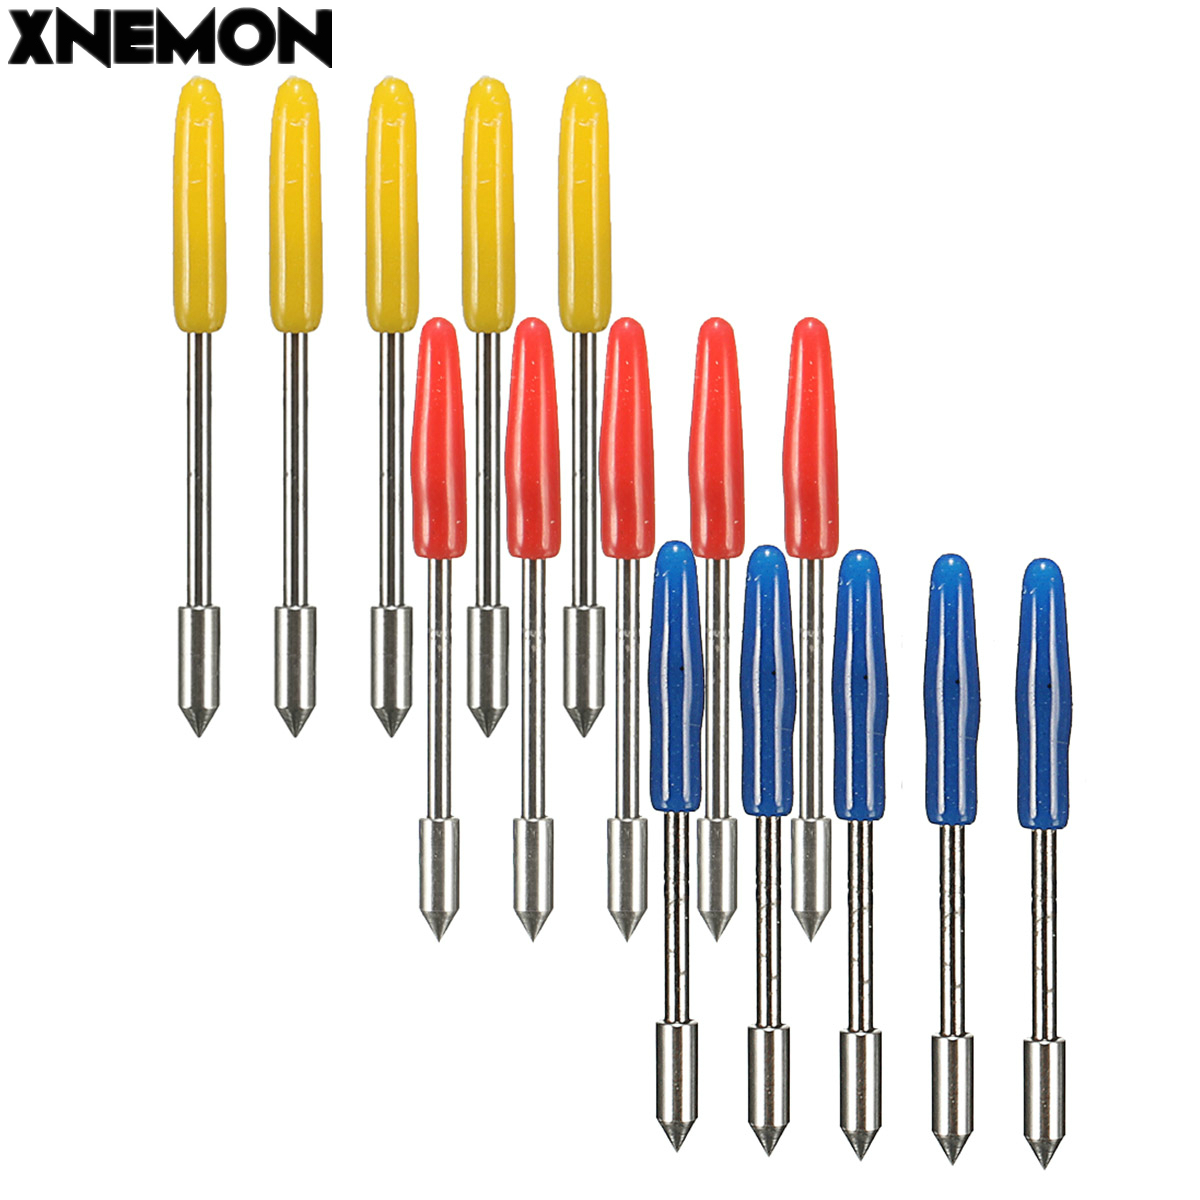 XNEMON 5pcs Engraving Machine Blades Cutter For Graphtec CB09 Vinyl Cutter Plotter Handle Diameter: 1mm Overall Length:20mm